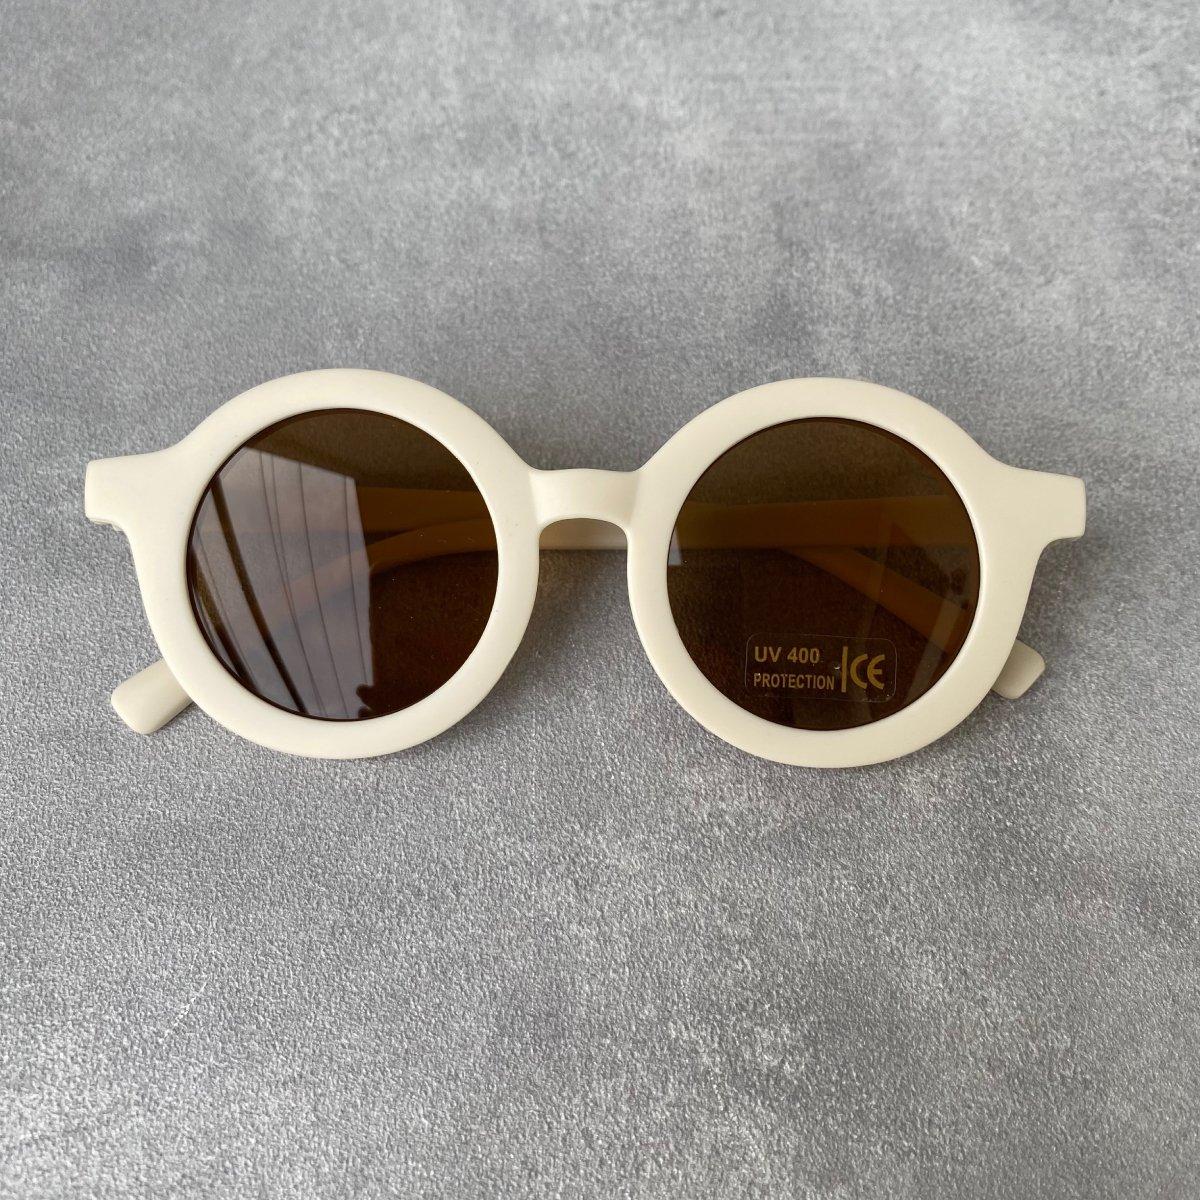 【KIDS】Kids Colorful Sunglasses 詳細画像4